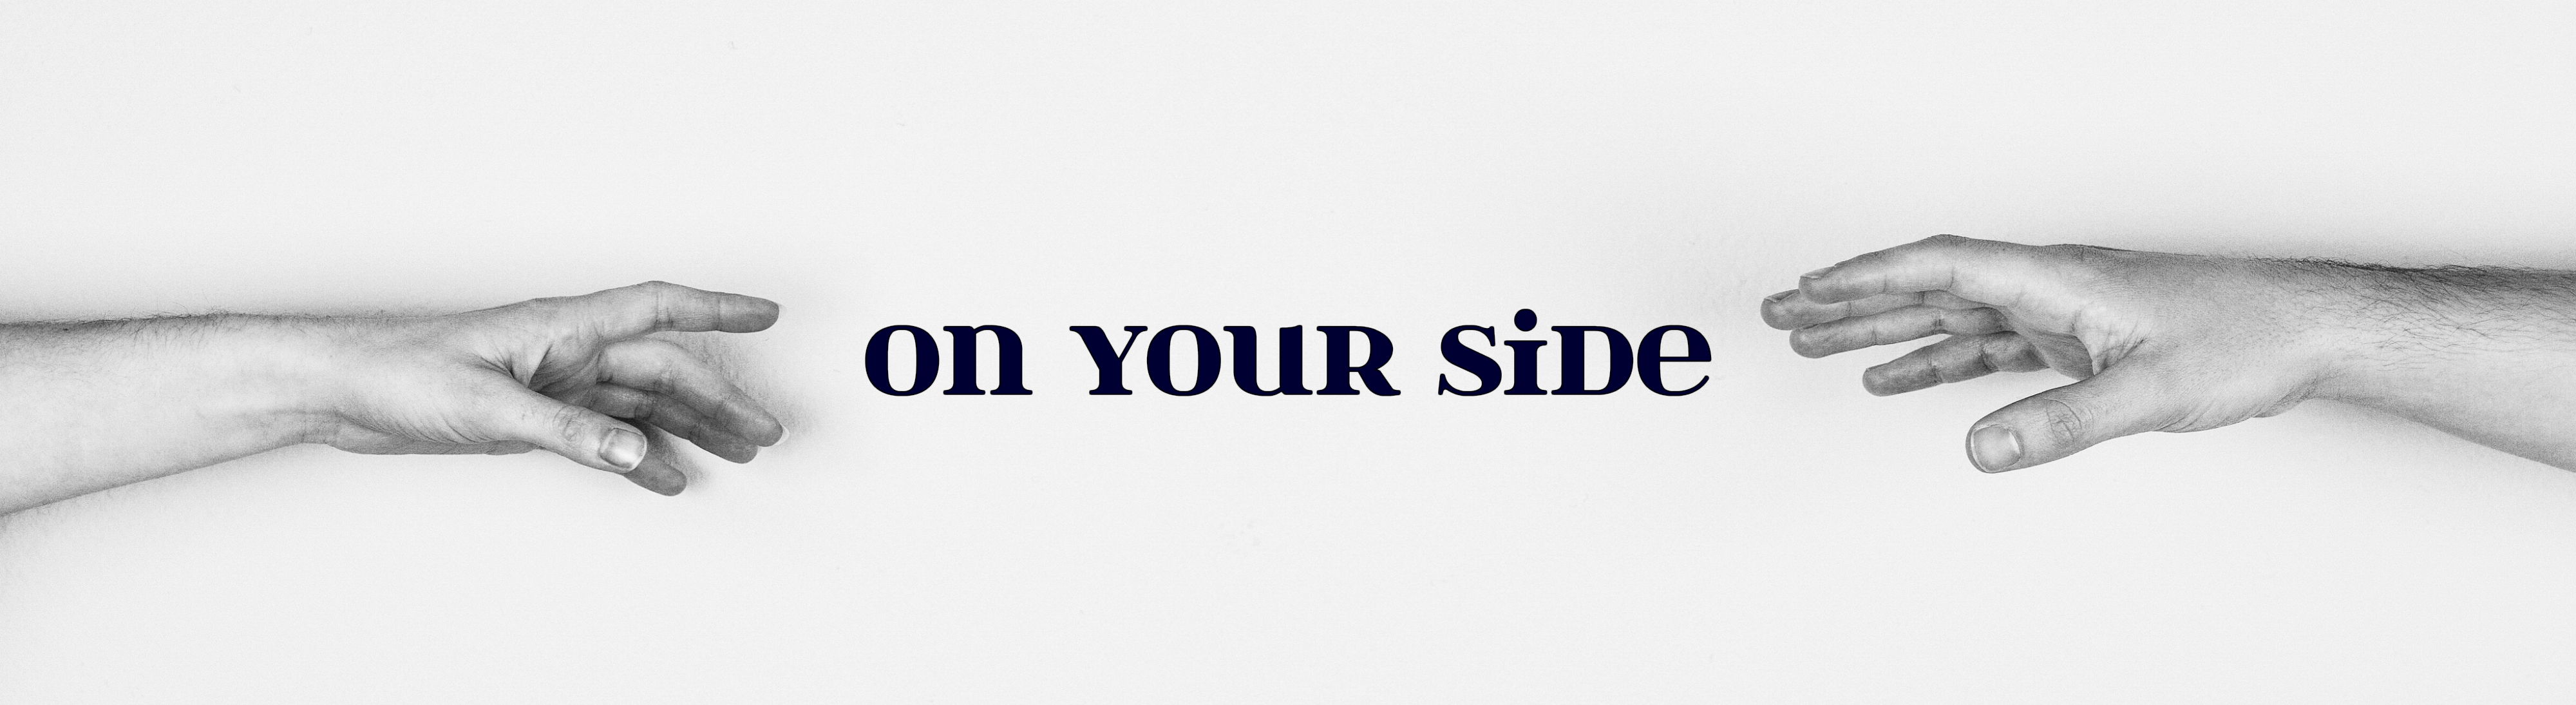 On Your Side Header